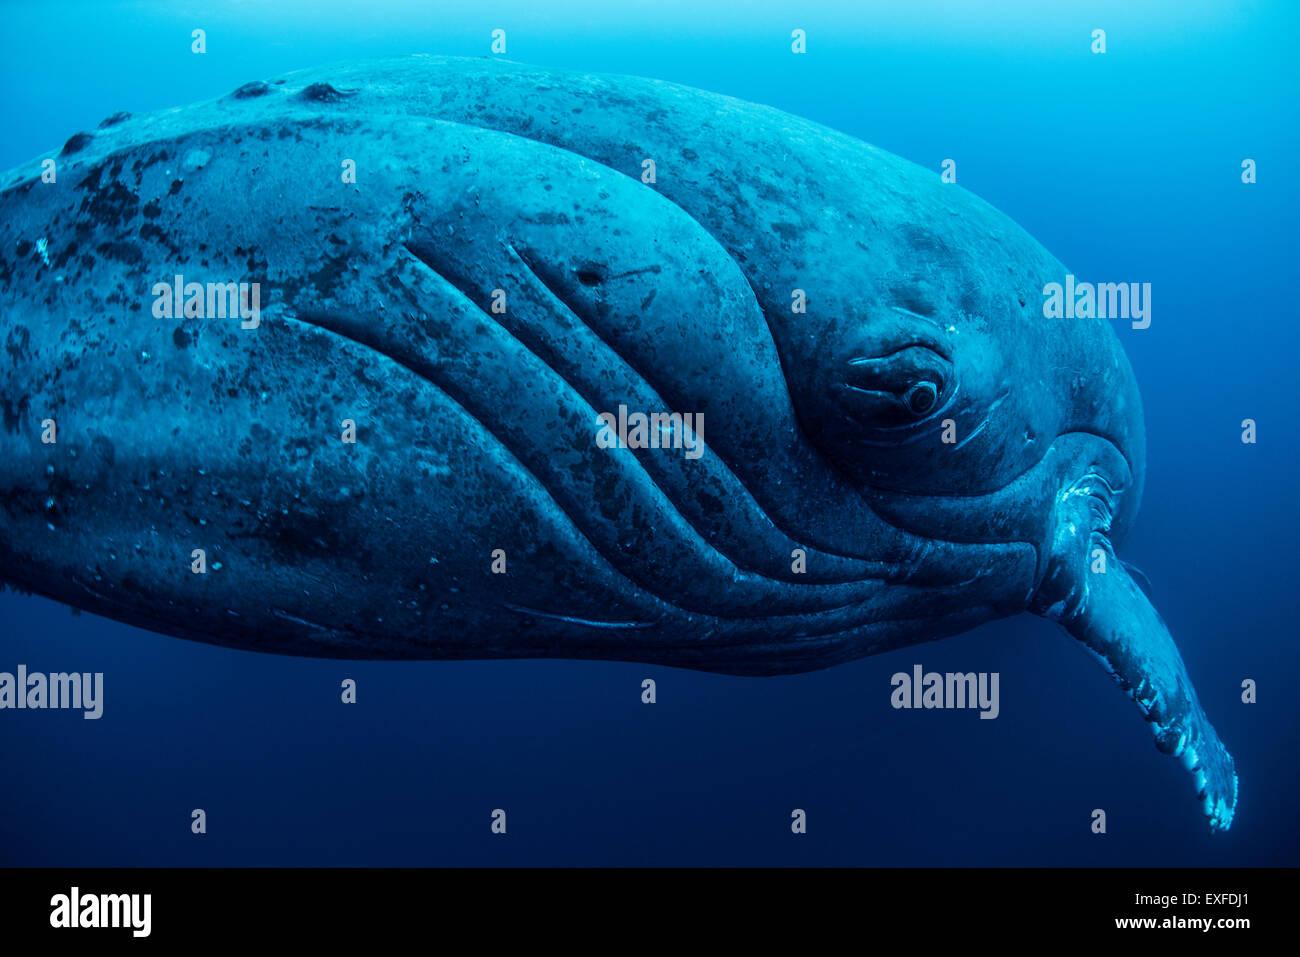 Femme curieuse baleine à bosse, gros plan, Roca Partida, Revillagigedo, Mexique Photo Stock